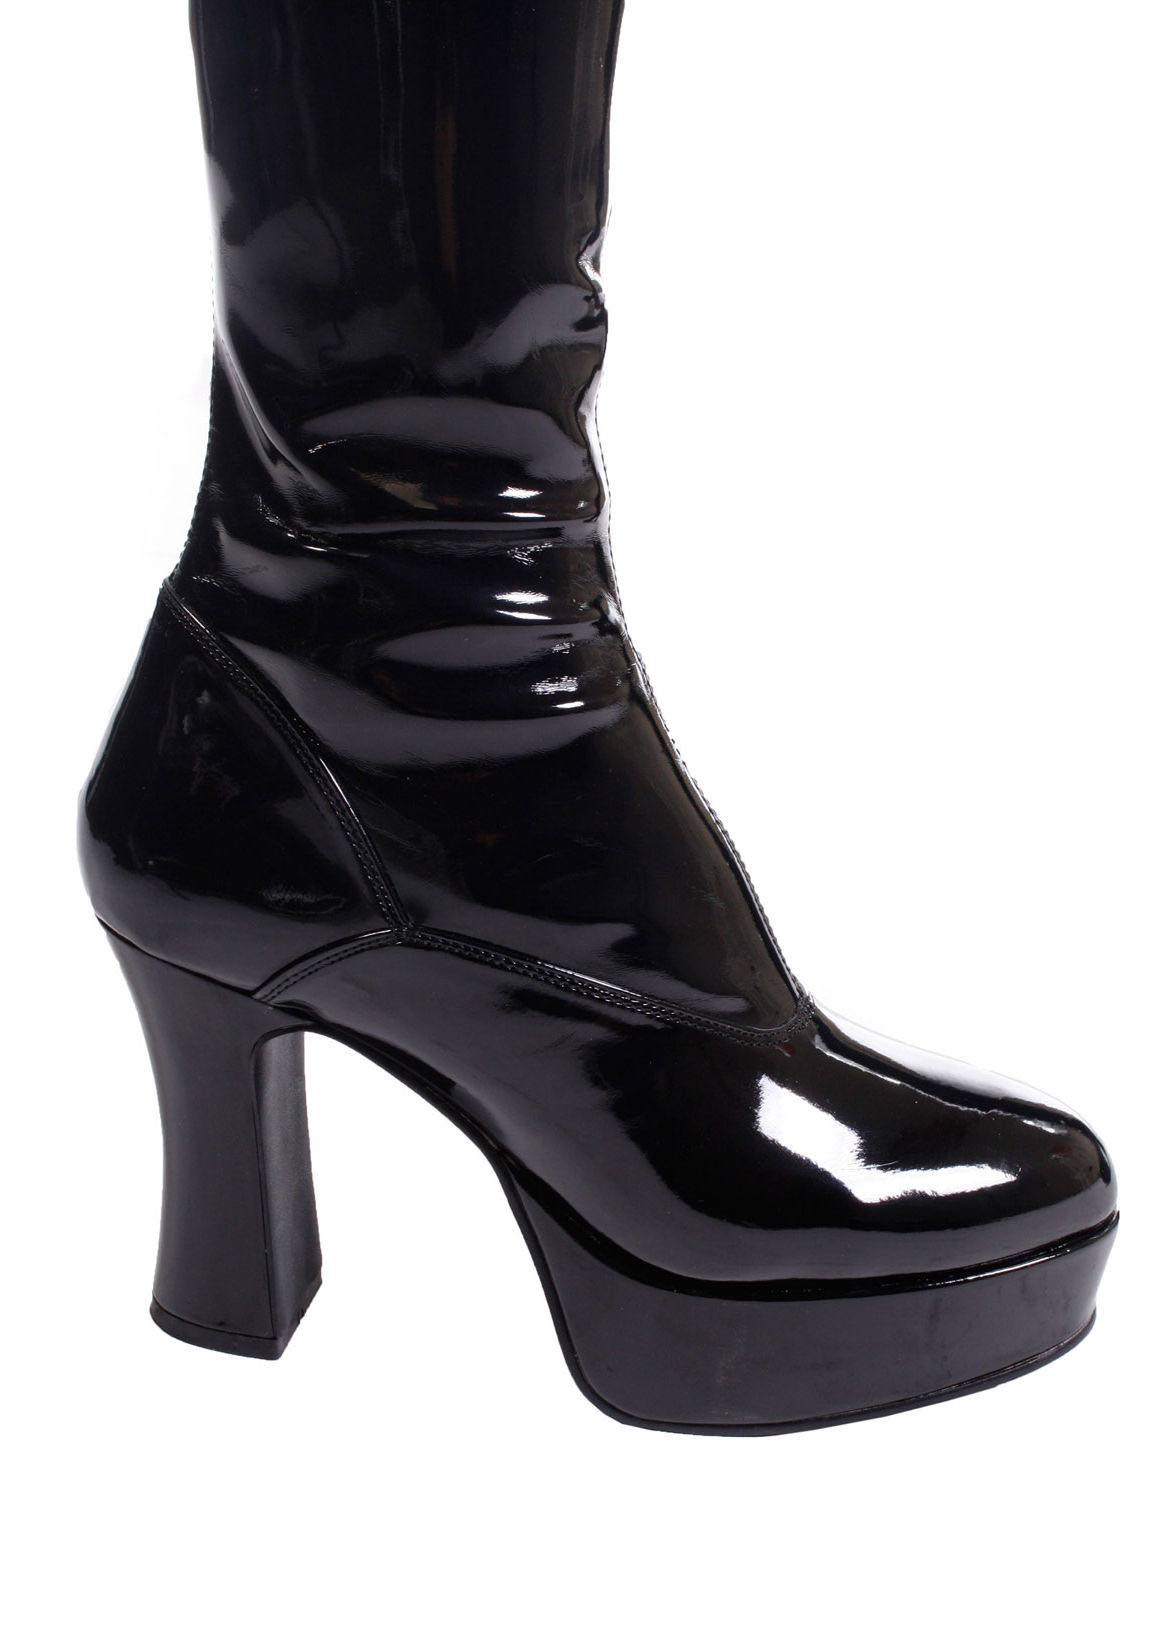 funtasma exotica 2000 4 inch heel platform gogo boot ebay